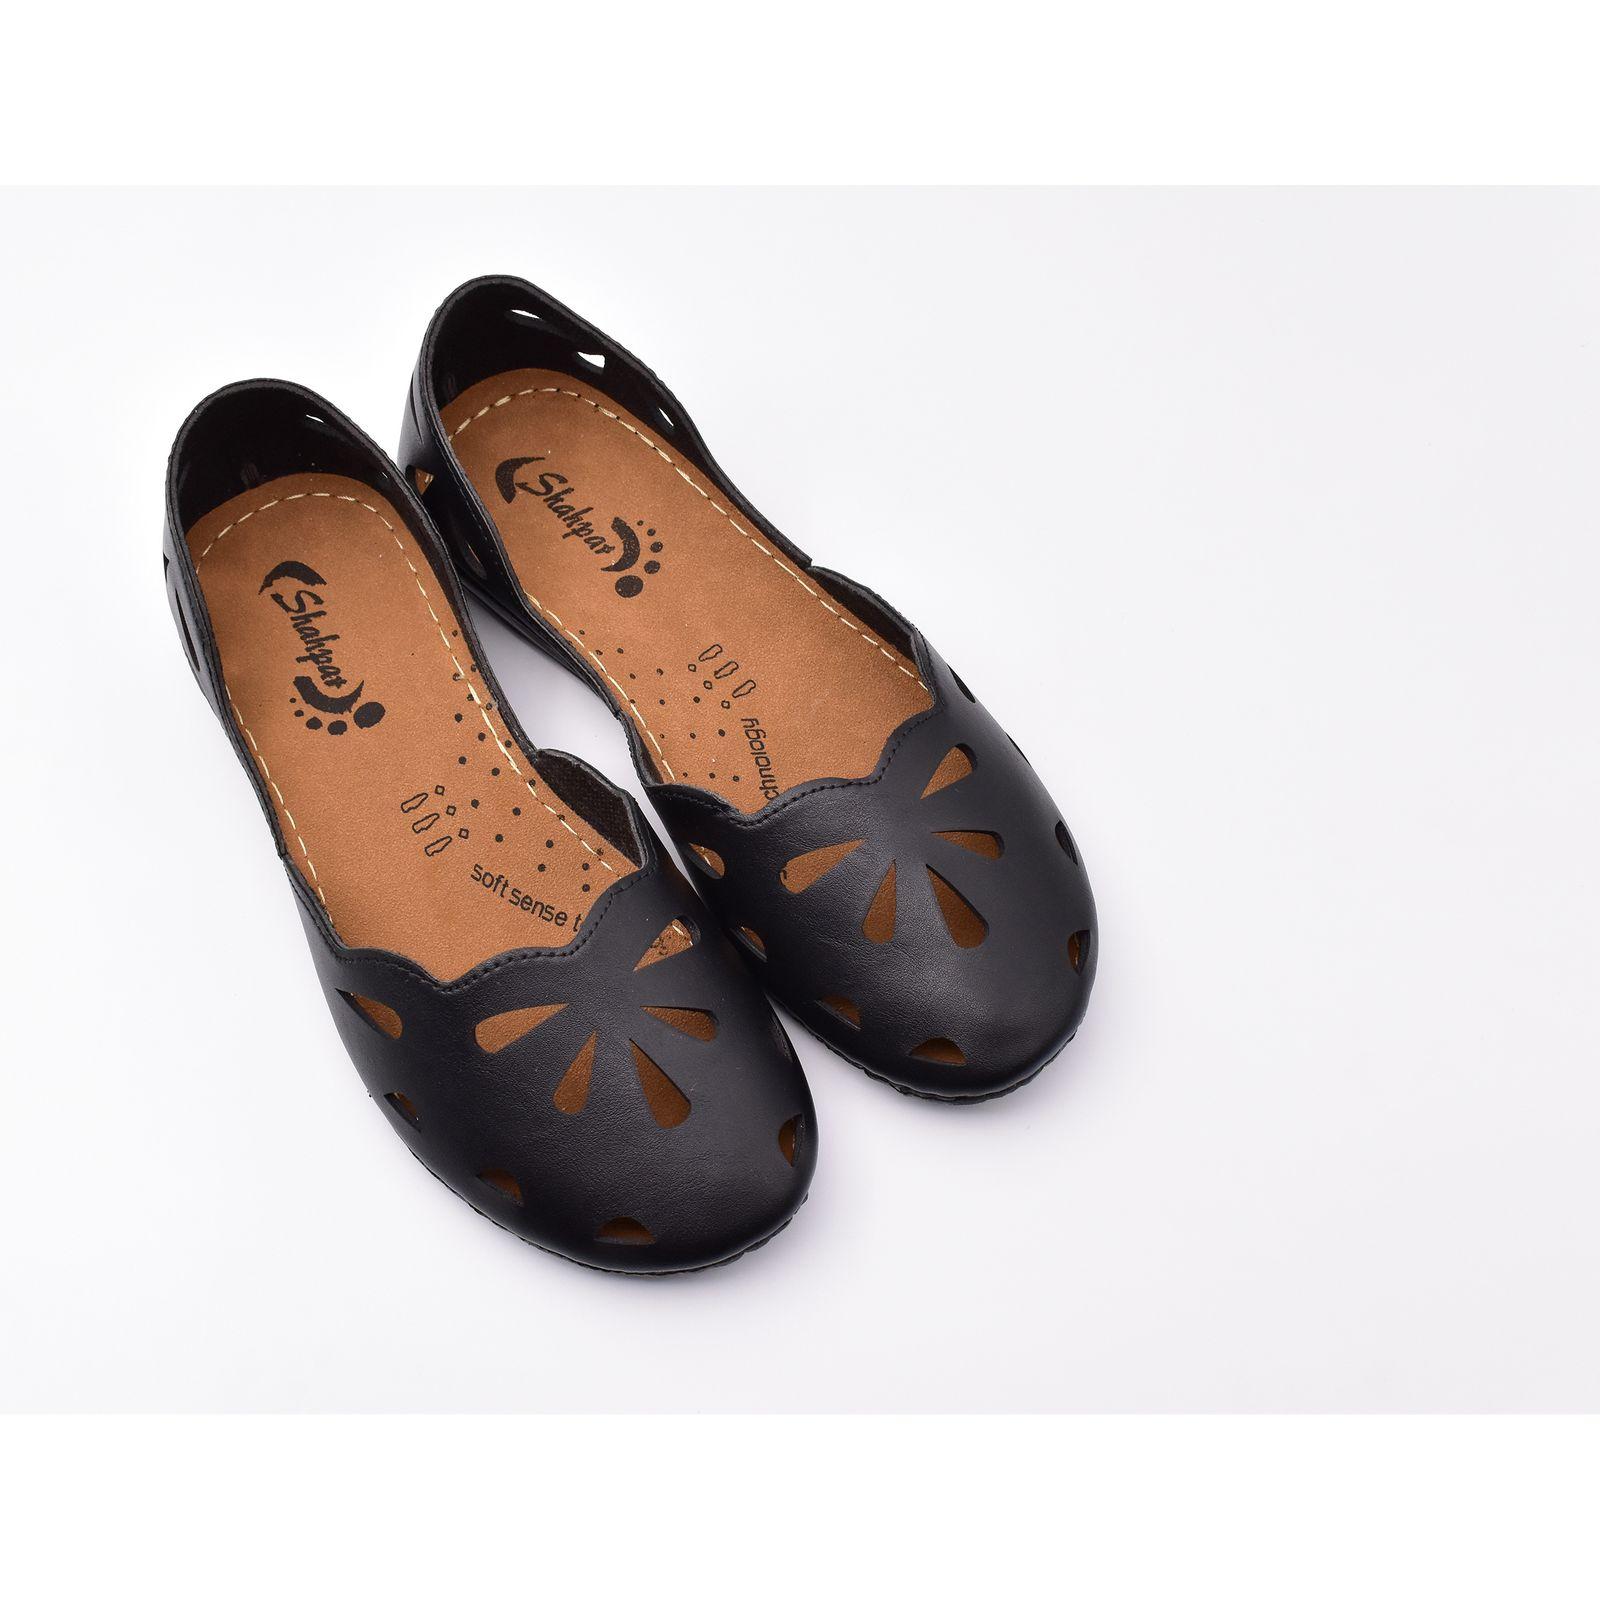 کفش زنانه شهپر مدل رویا 109 کد 7187 -  - 4